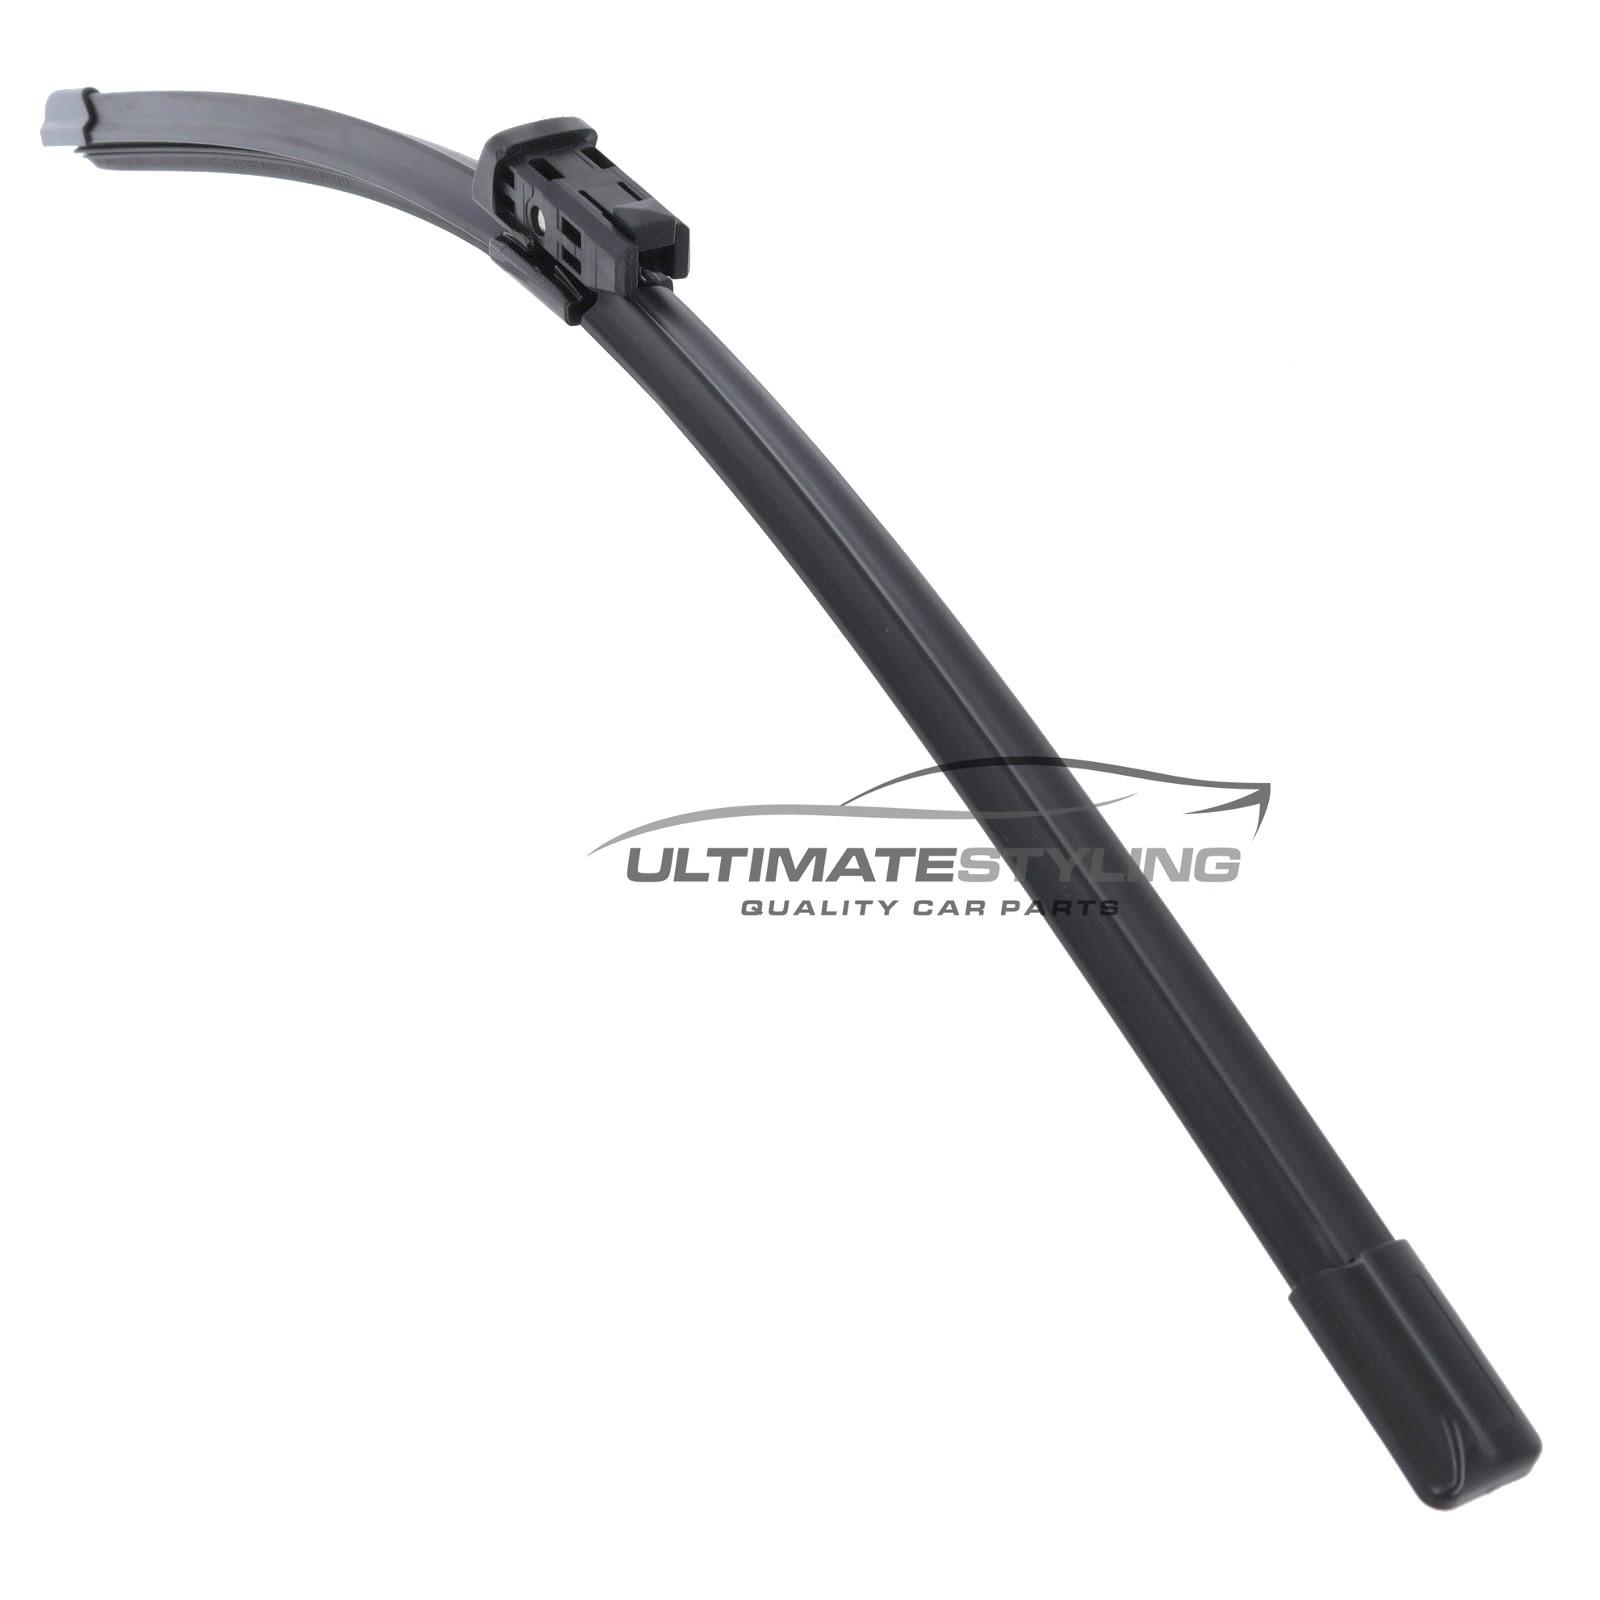 Wiper Blade - Exact Fit Aero Blade - 50 cm - 20 inch - Multi Fitment